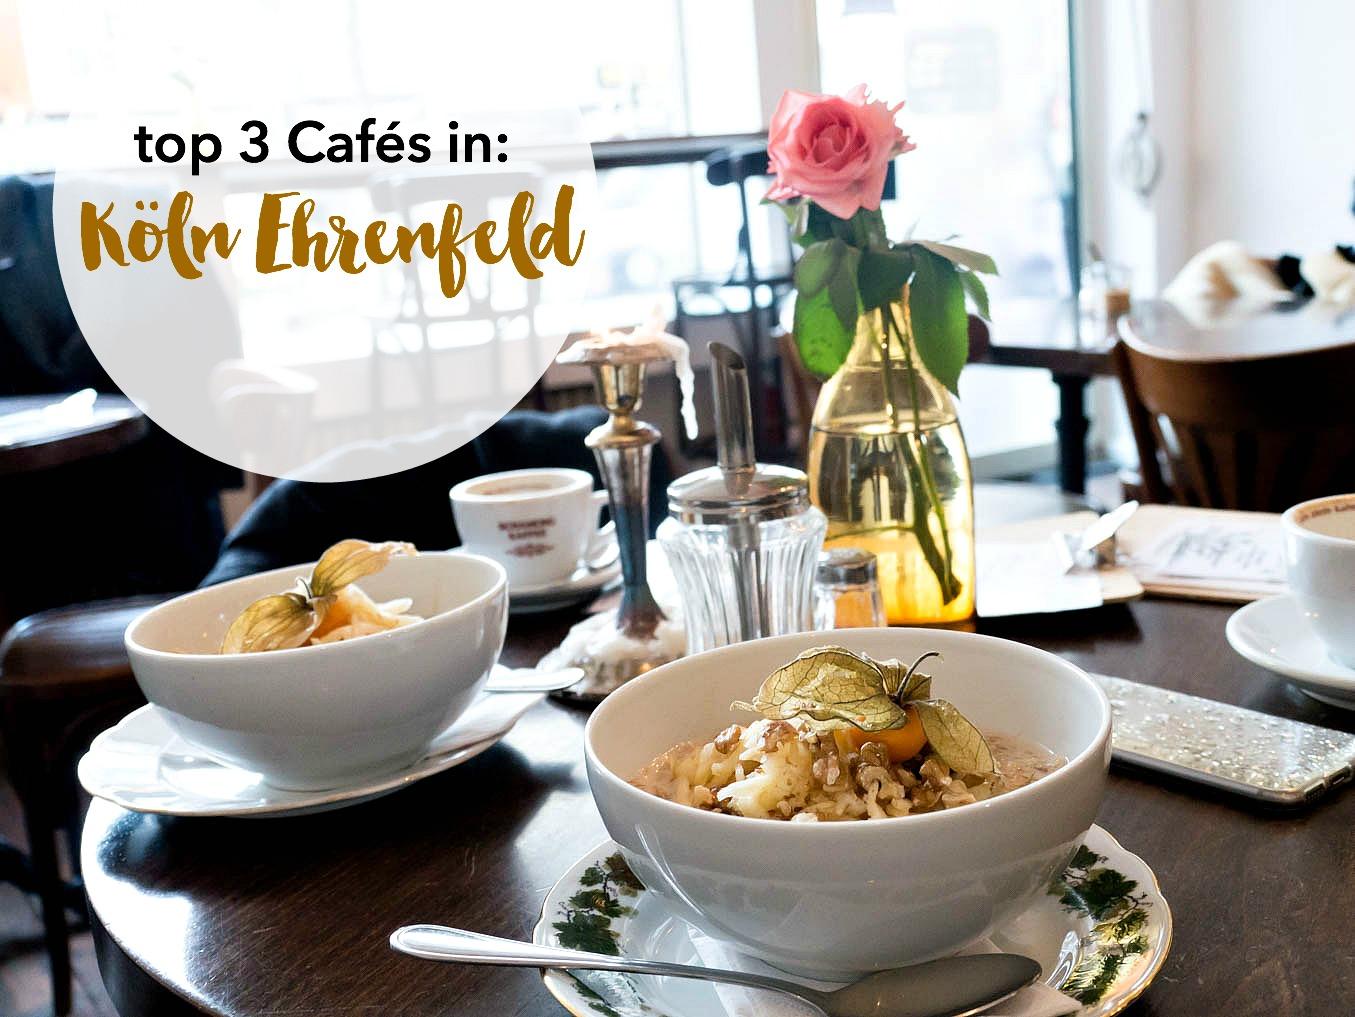 Mein top 3 Cafés in Köln Ehrenfeld.